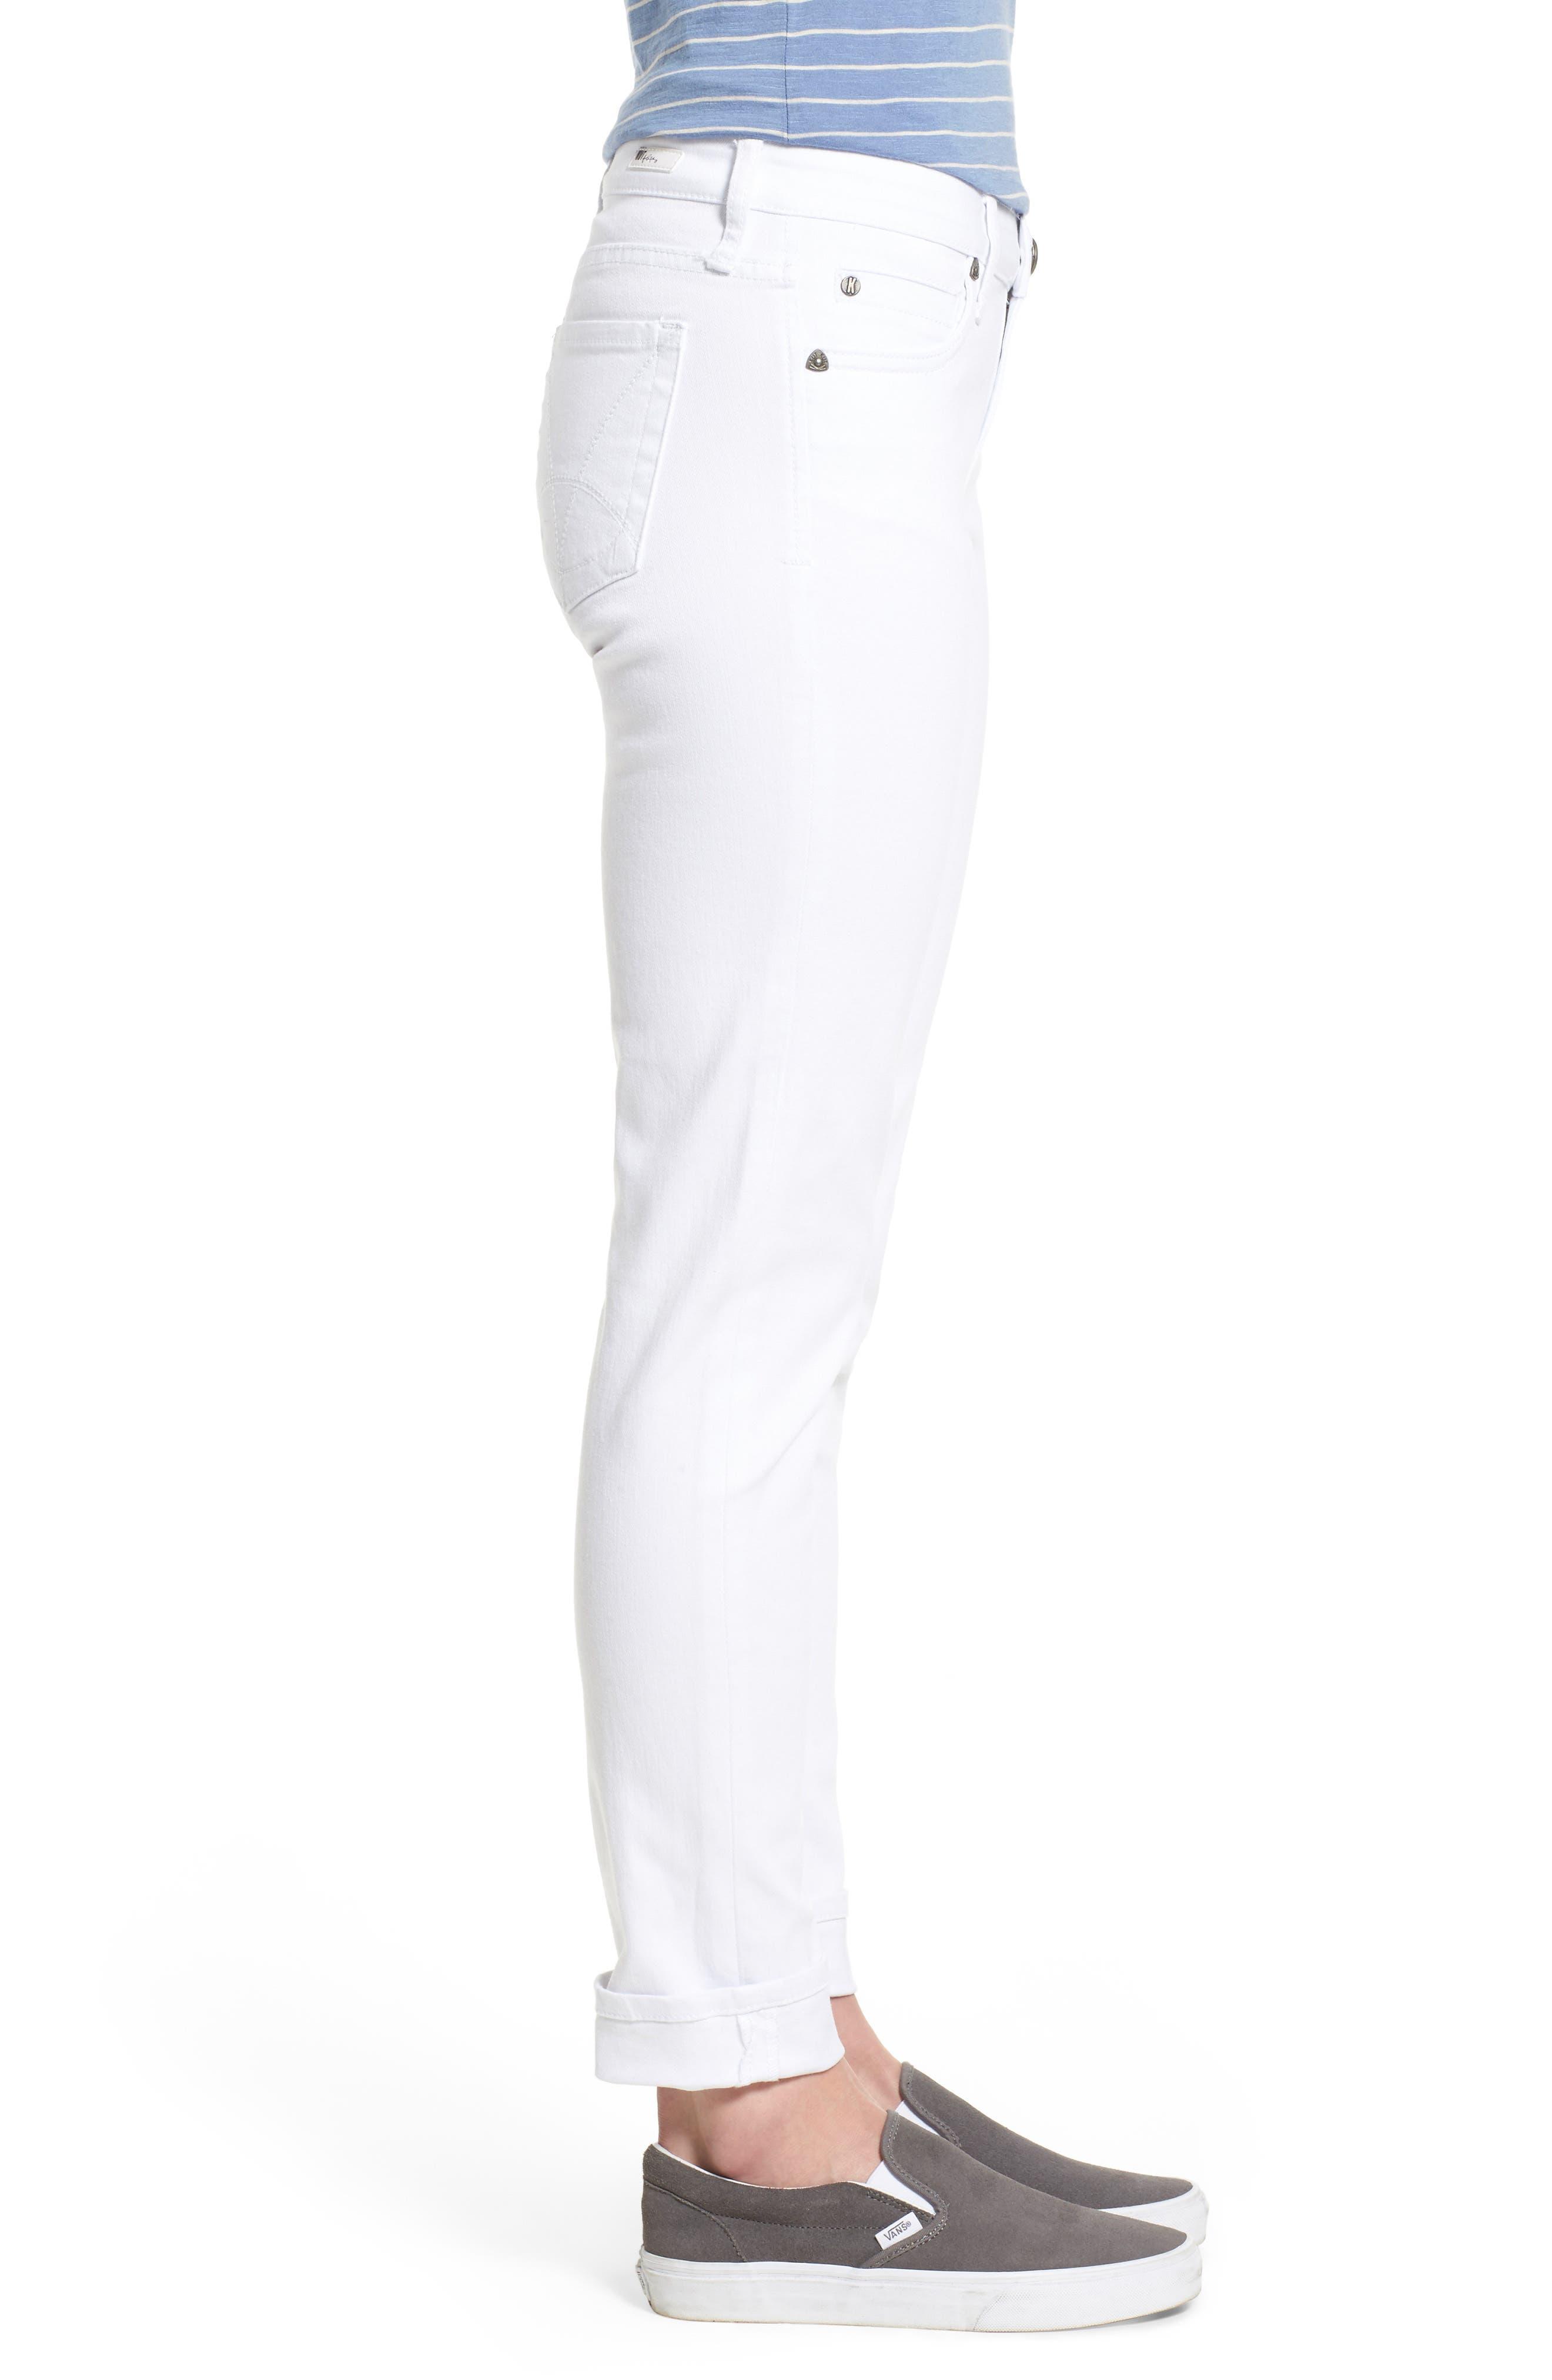 Catherine Stretch Boyfriend Jeans,                             Alternate thumbnail 4, color,                             White